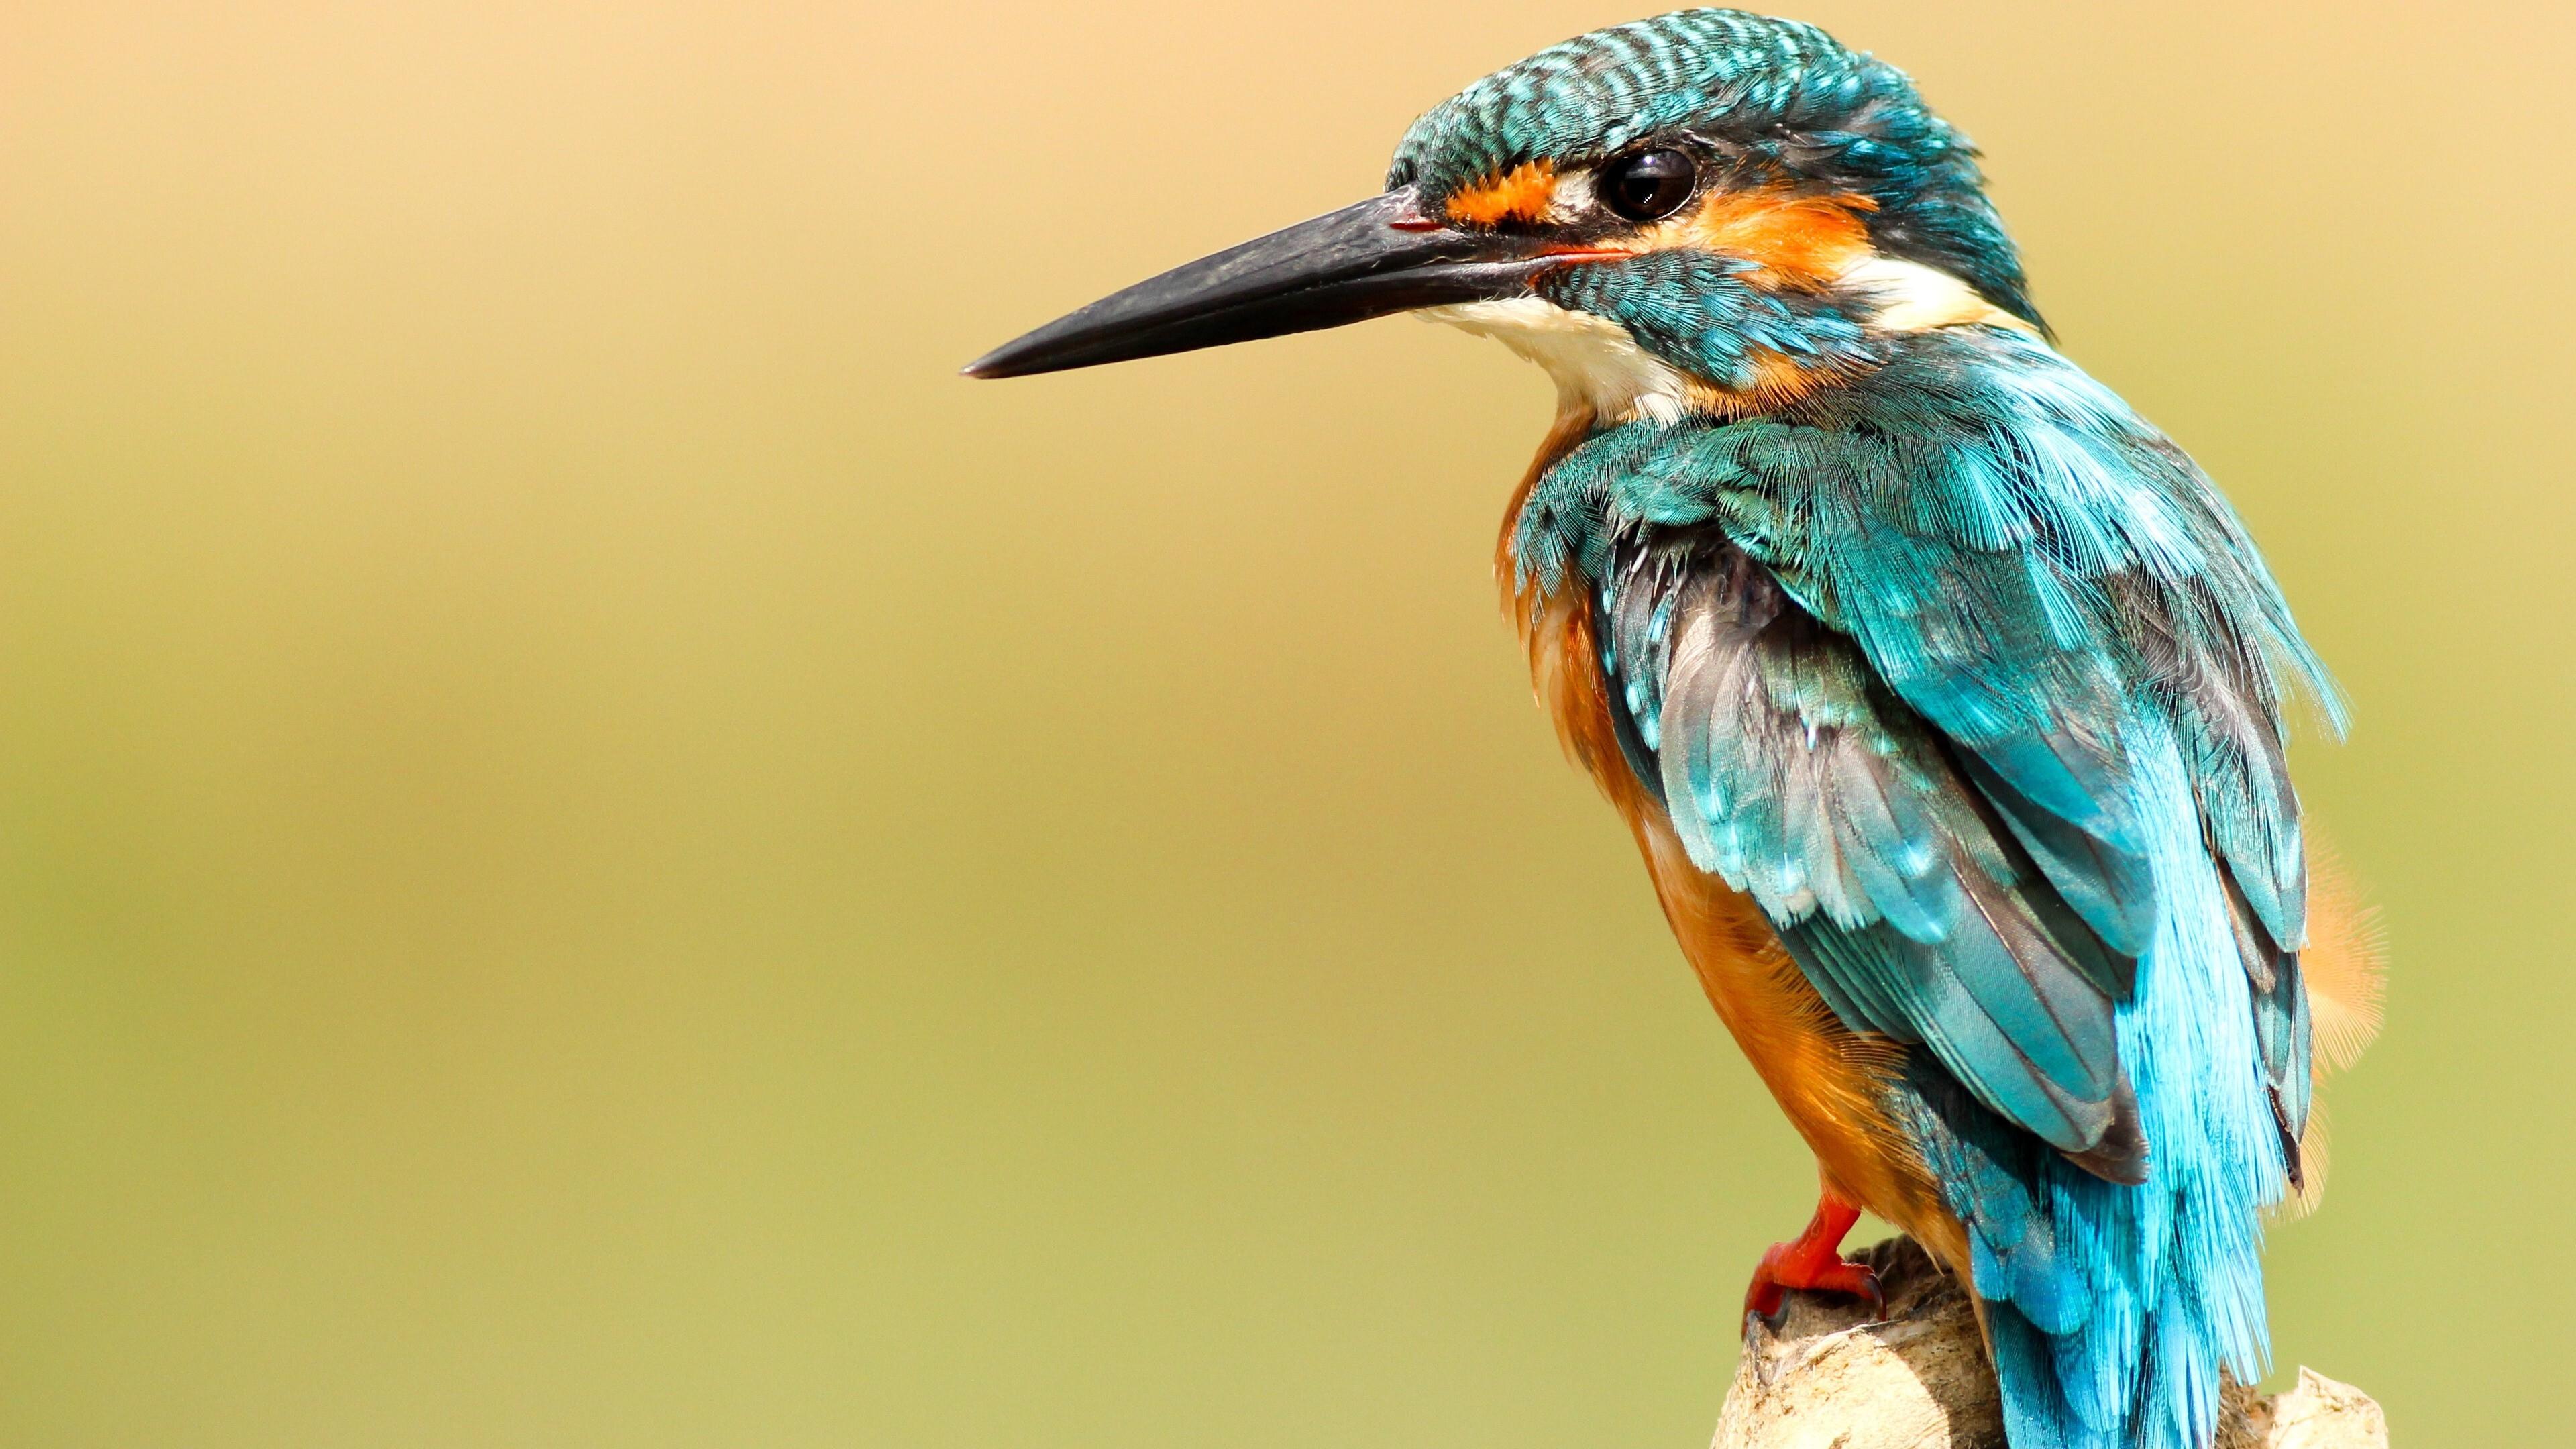 Beautiful Kingfisher Bird Wallpaper